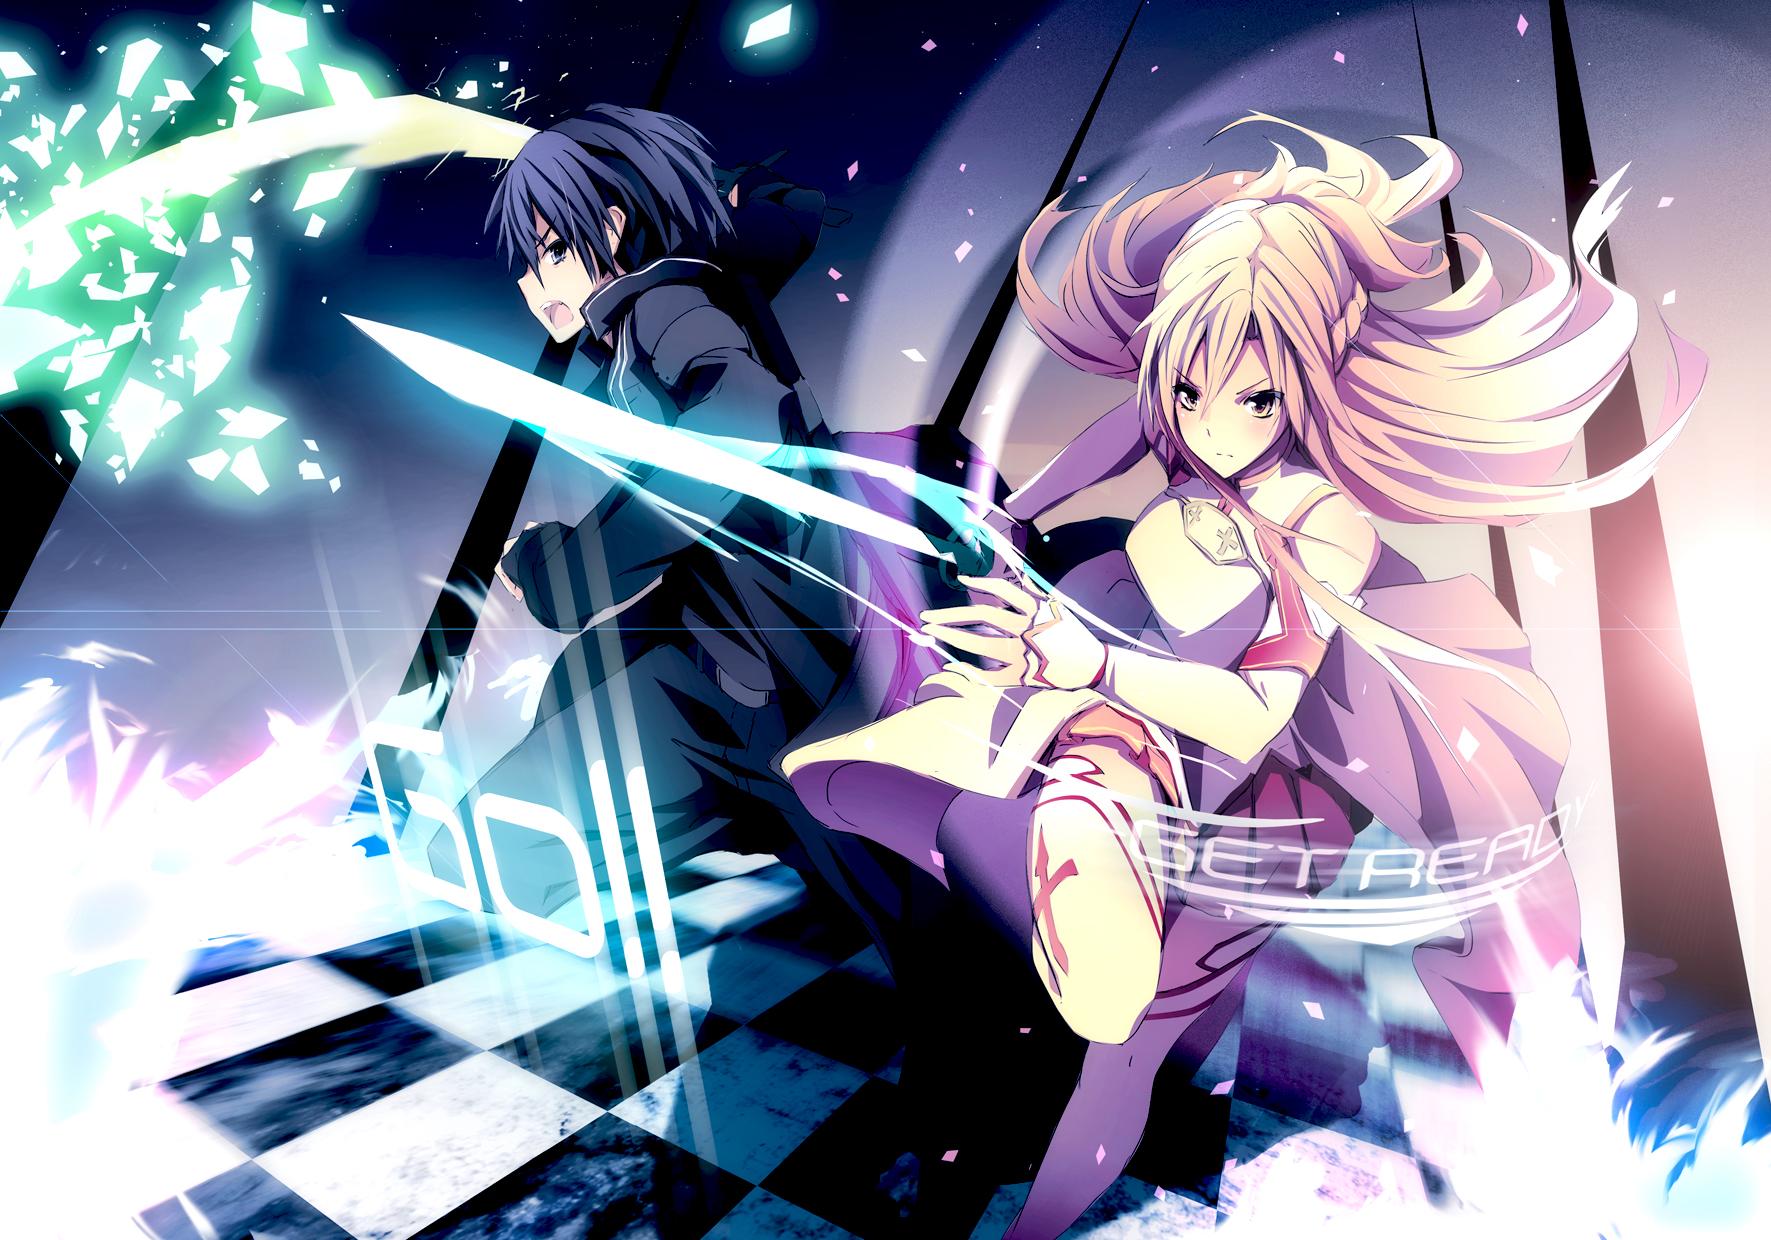 Sword Art Online Coming To Toonami - Anime Power ...